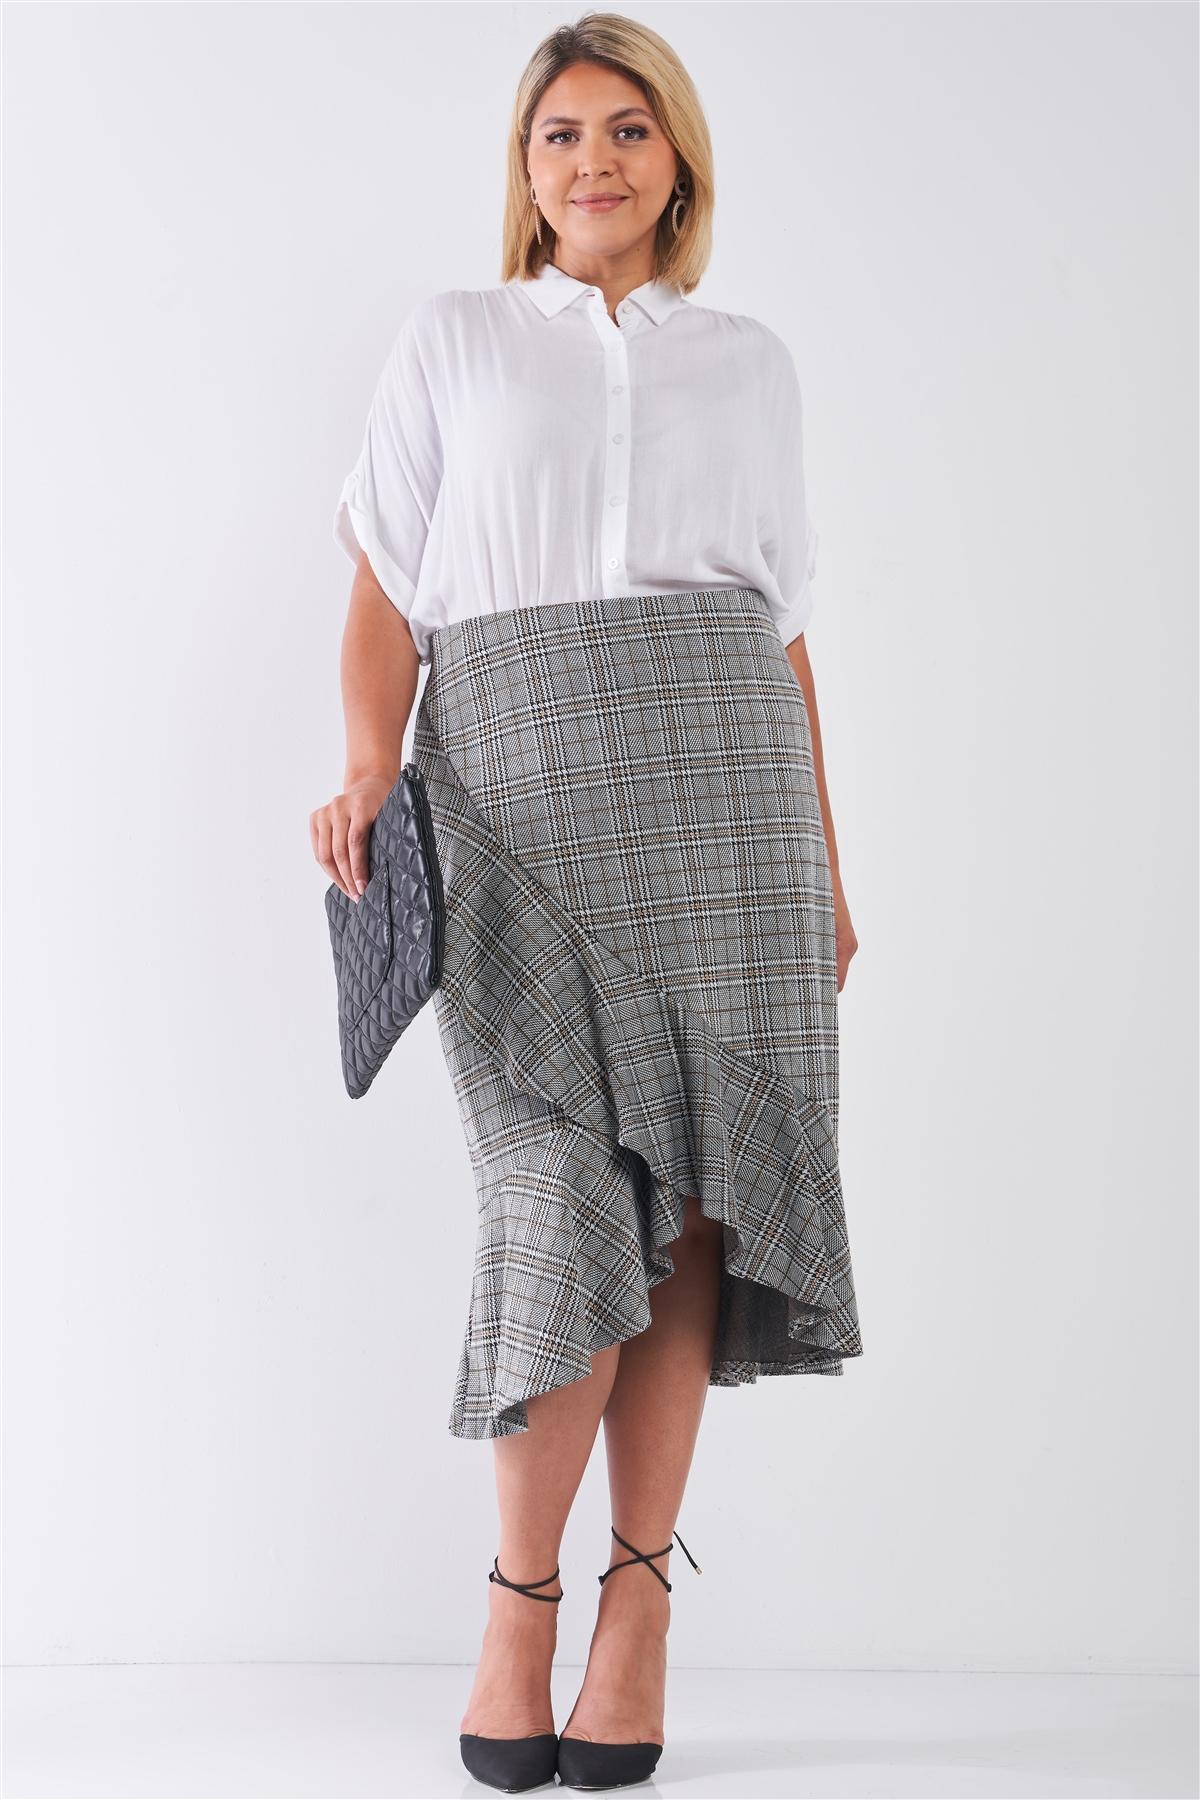 c532952105 Long Gray Skirt Plus Size - Gomes Weine AG